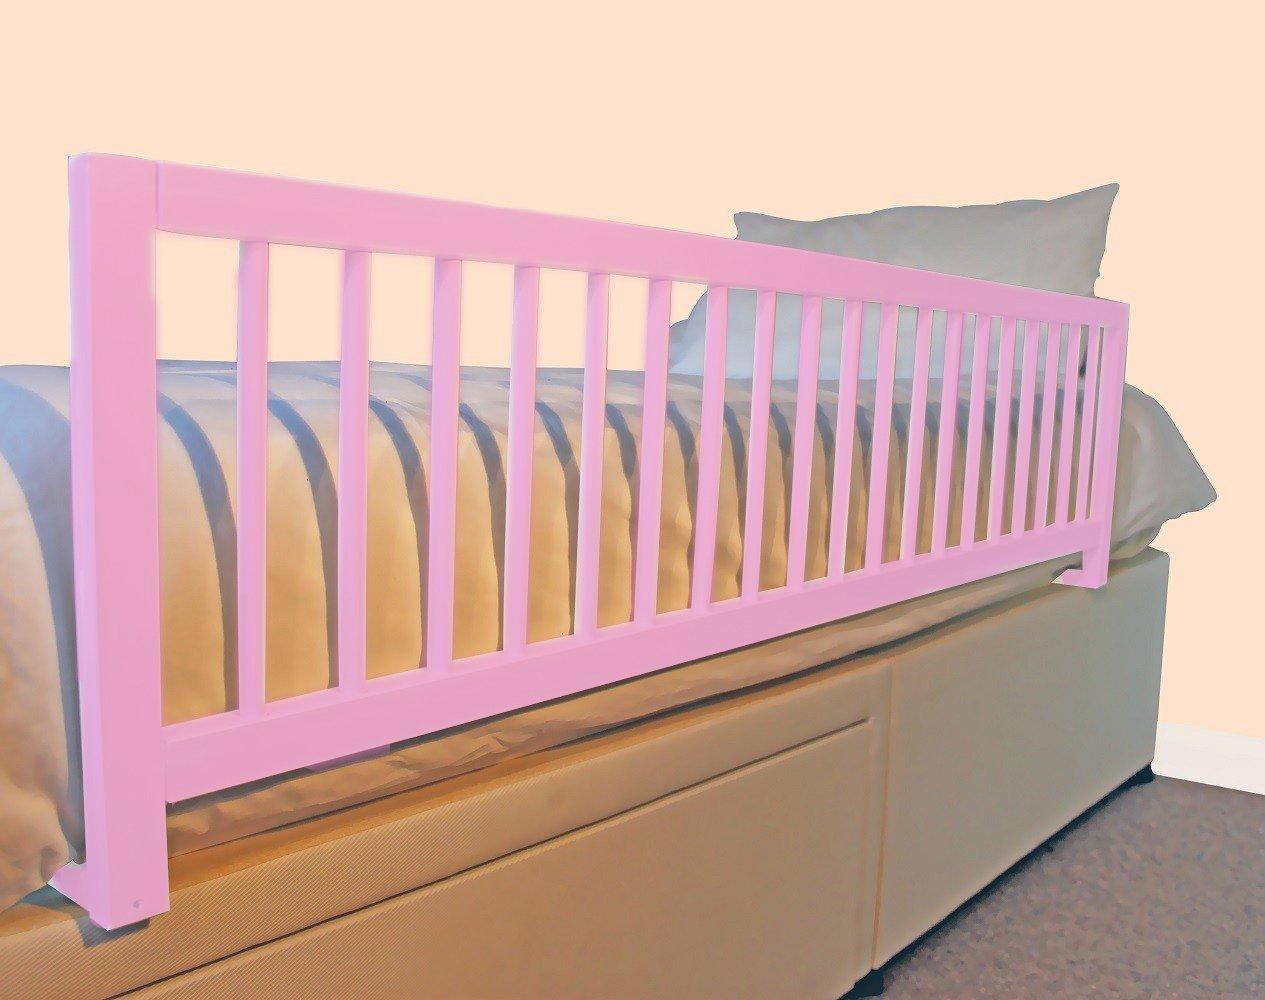 Safetots - Paracolpi per letto, extra largo, in legno, colore: rosa Safetots Limited ST-EWWBRP